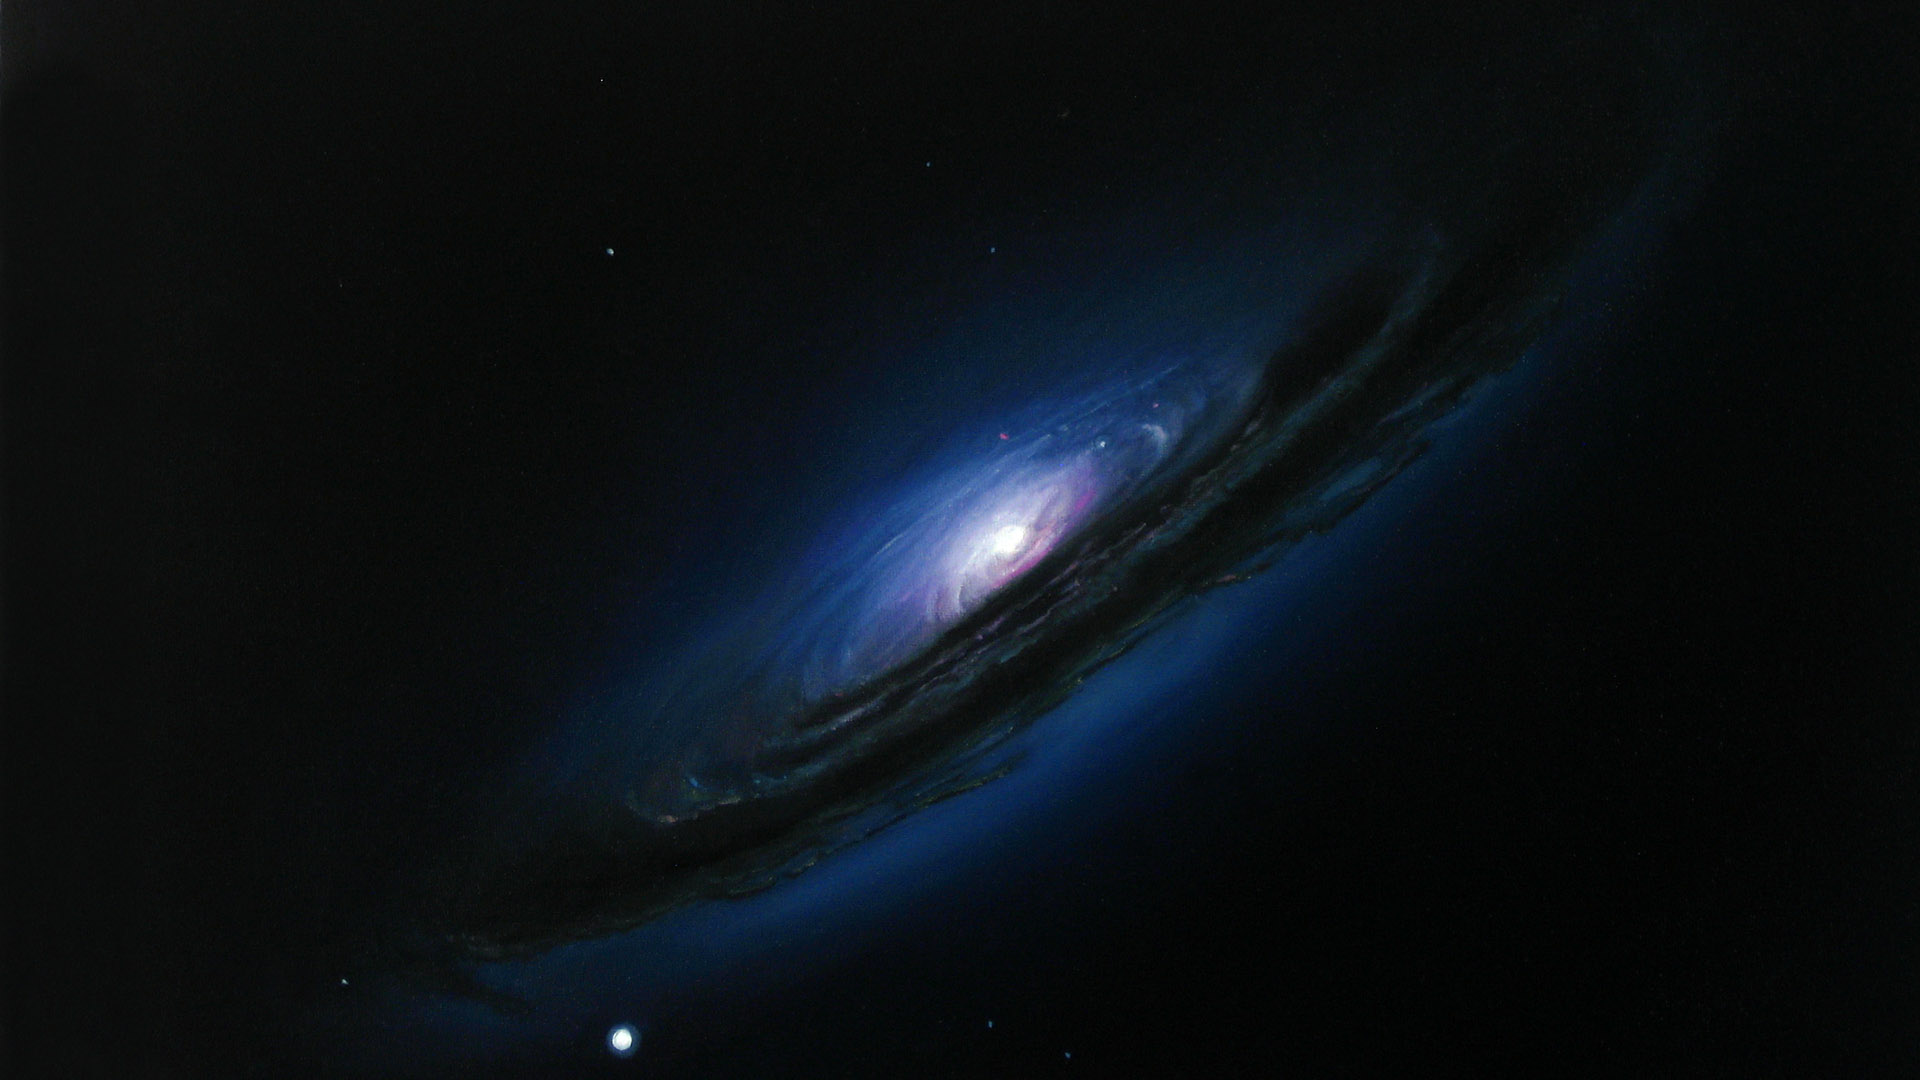 supernova sn 1994 d - photo #9